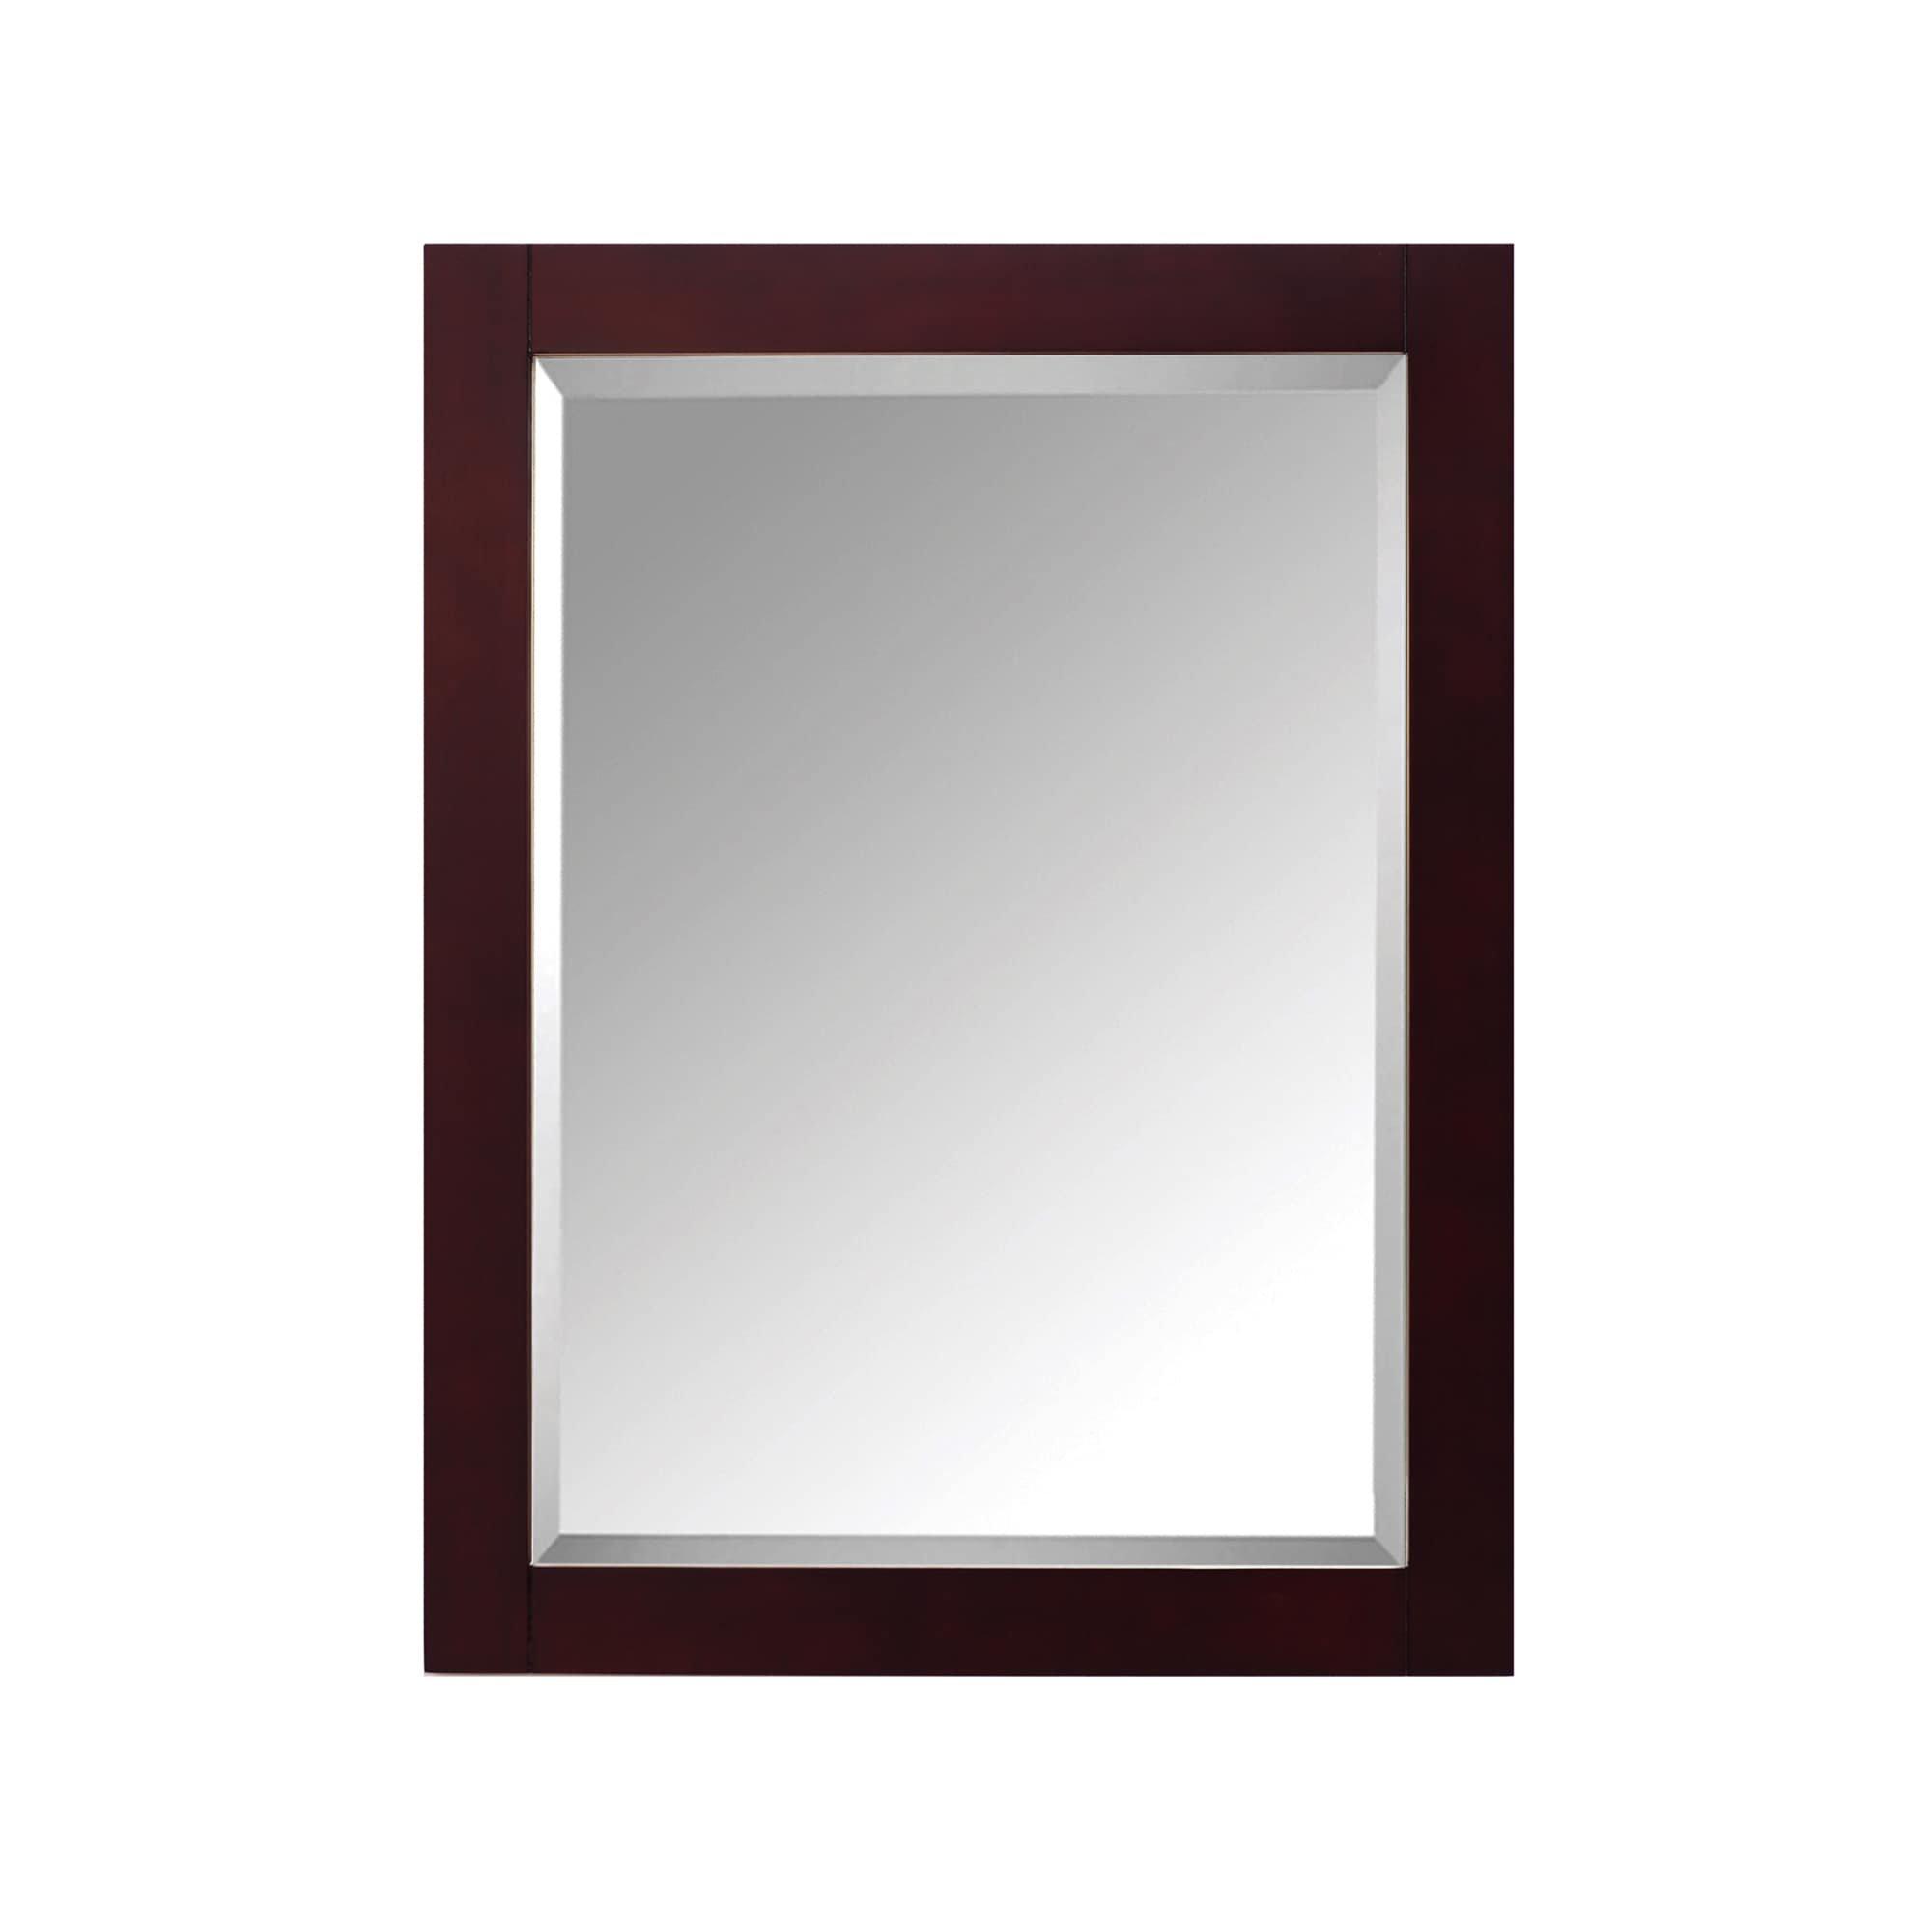 Avanity 24 in. Mirror for Modero in Espresso finish by Avanity